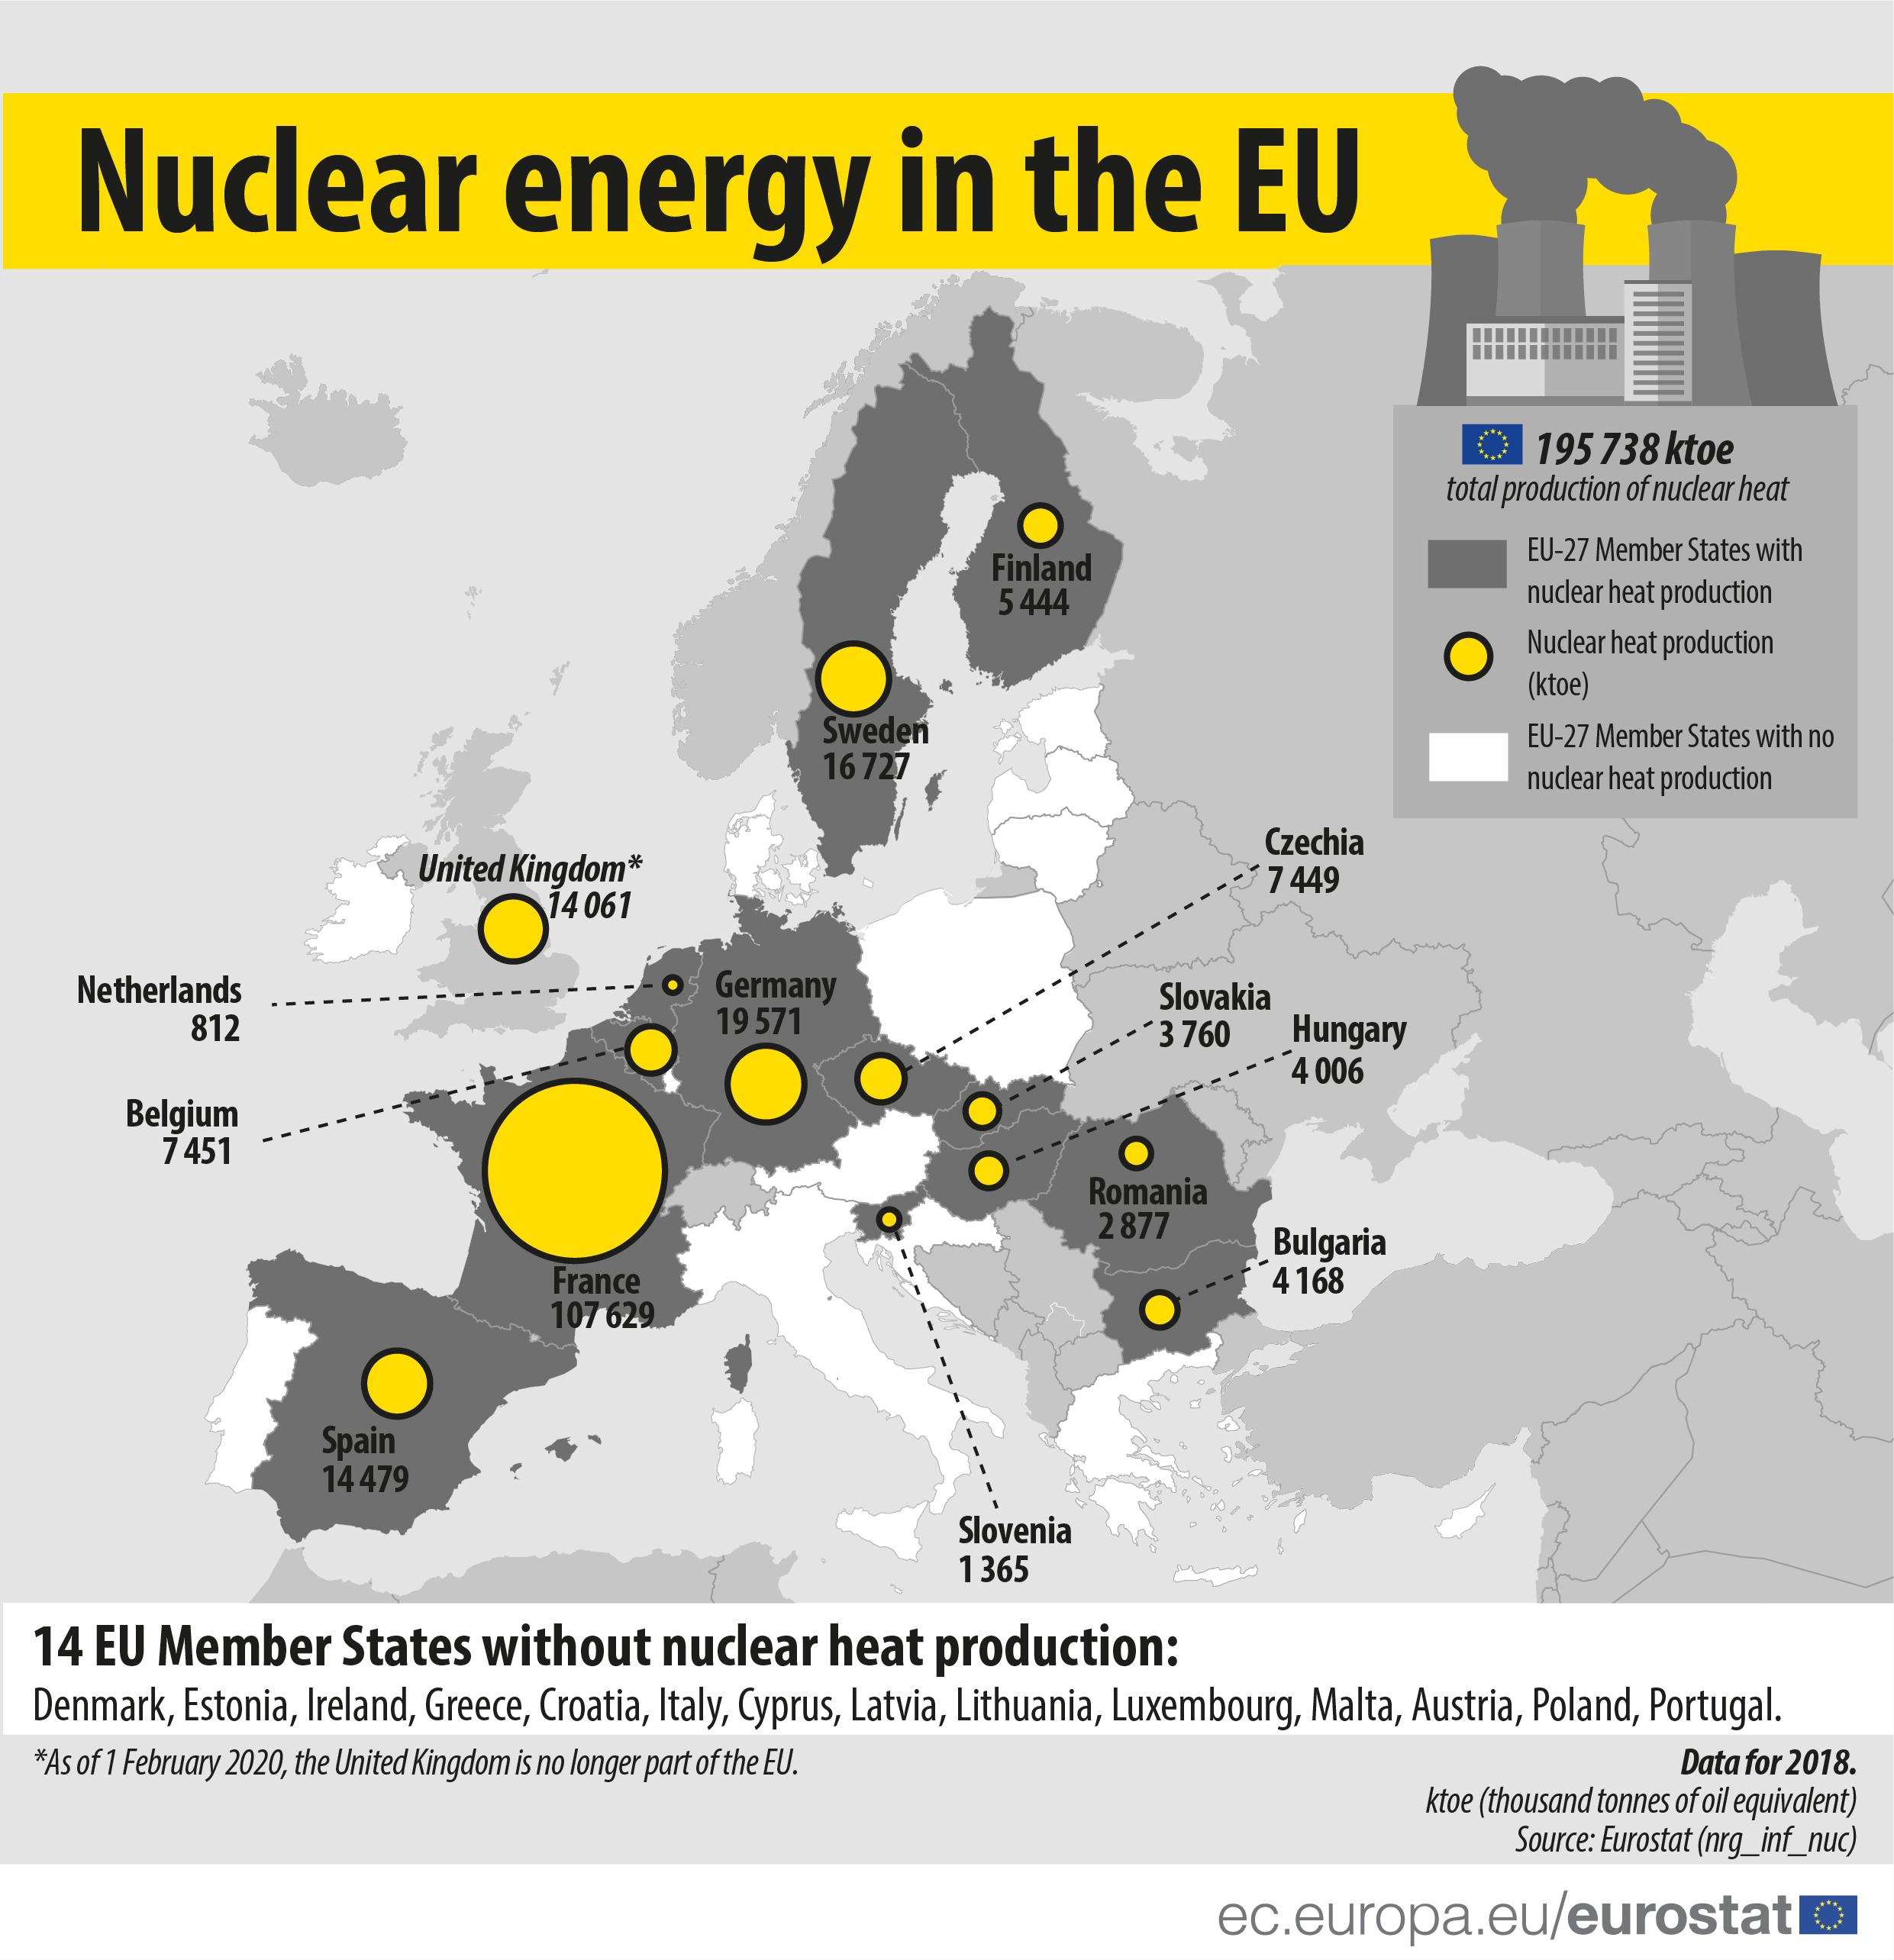 Nuclear energy in the EU